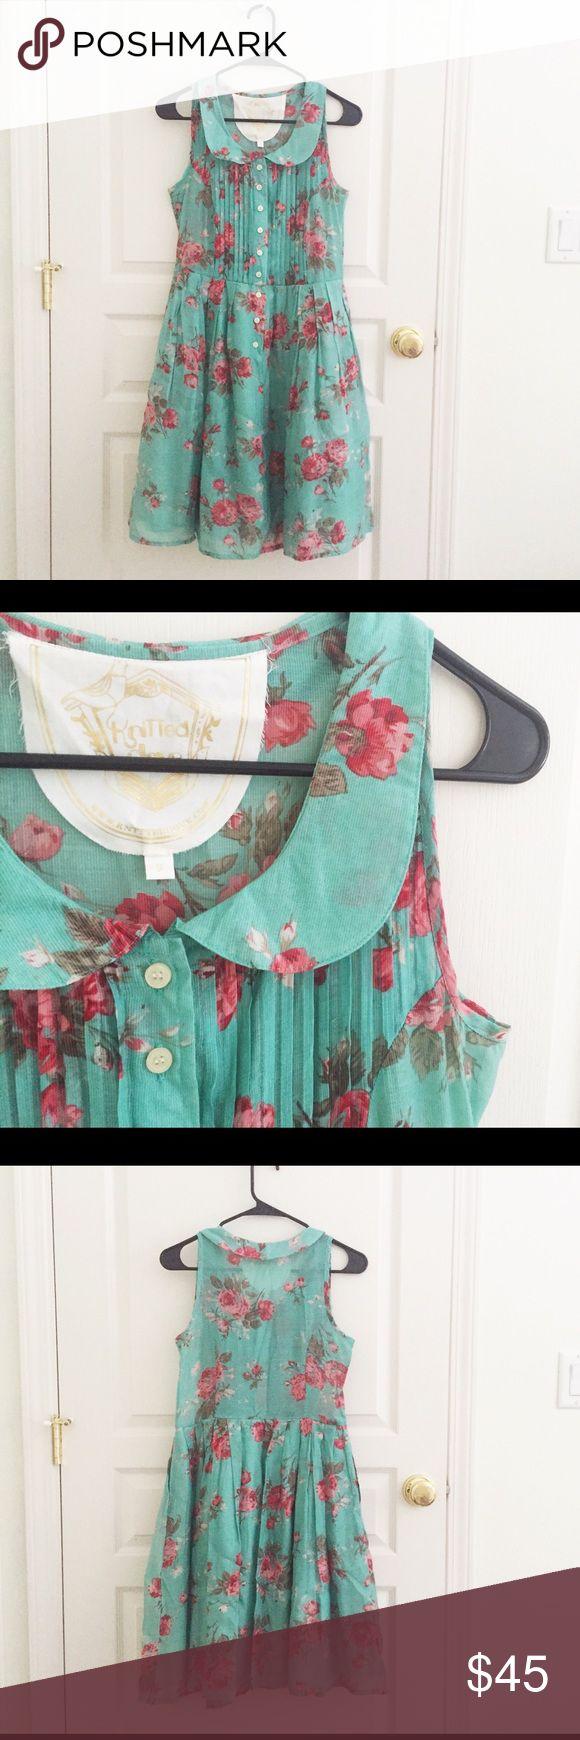 Selling this Modcloth floral sleeveless Peter Pan collar dress on Poshmark! My username is: wanderlust83. #shopmycloset #poshmark #fashion #shopping #style #forsale #ModCloth #Dresses & Skirts